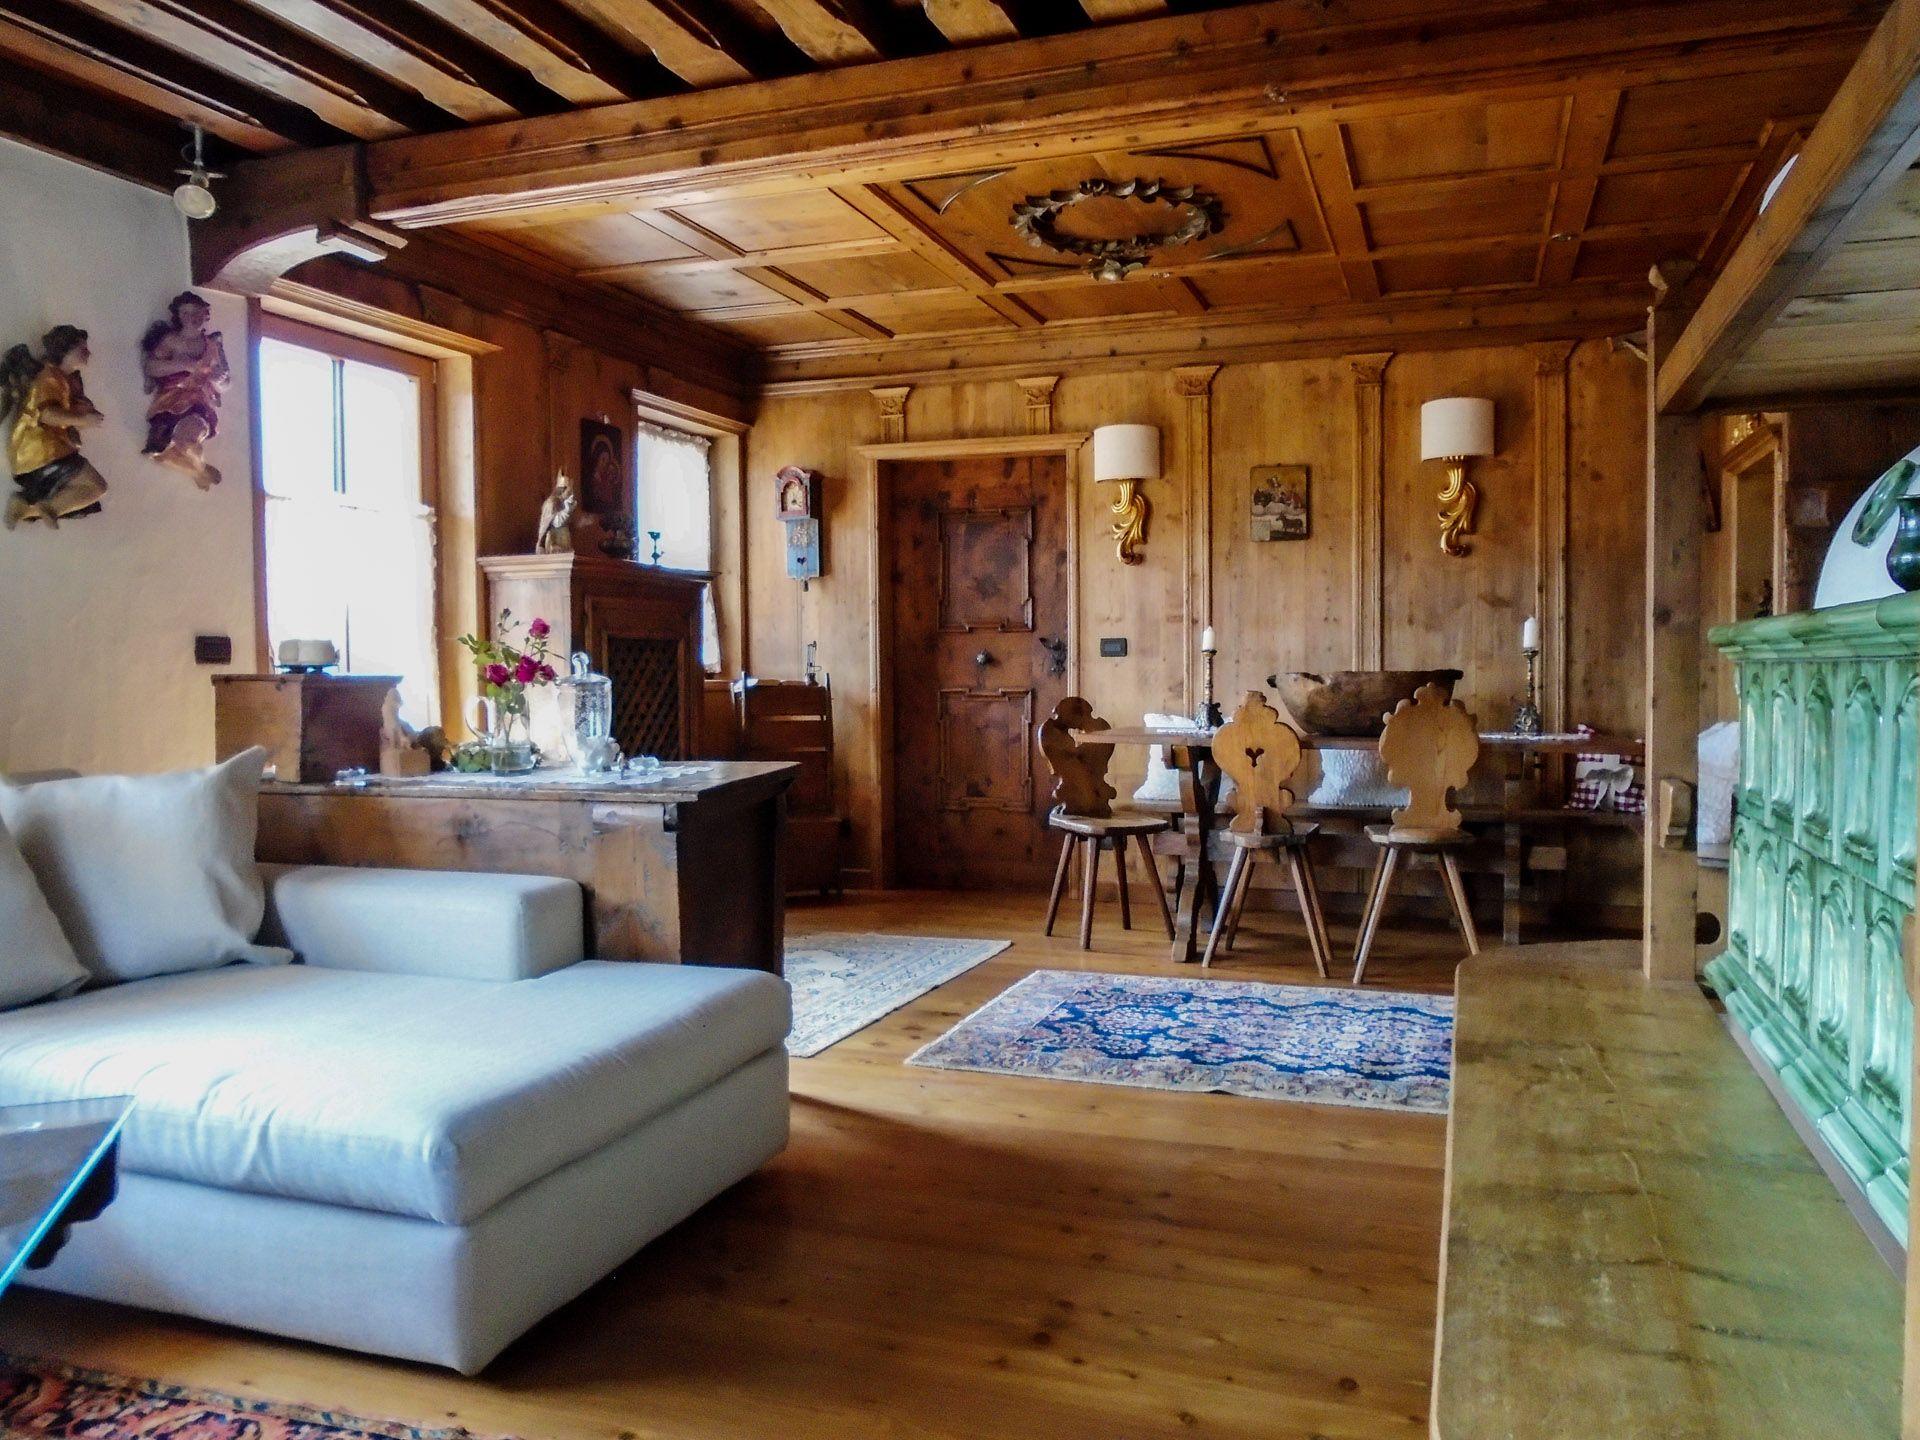 I nostri arredi - soluzioni per mobili antichi e moderni | Antichità ...